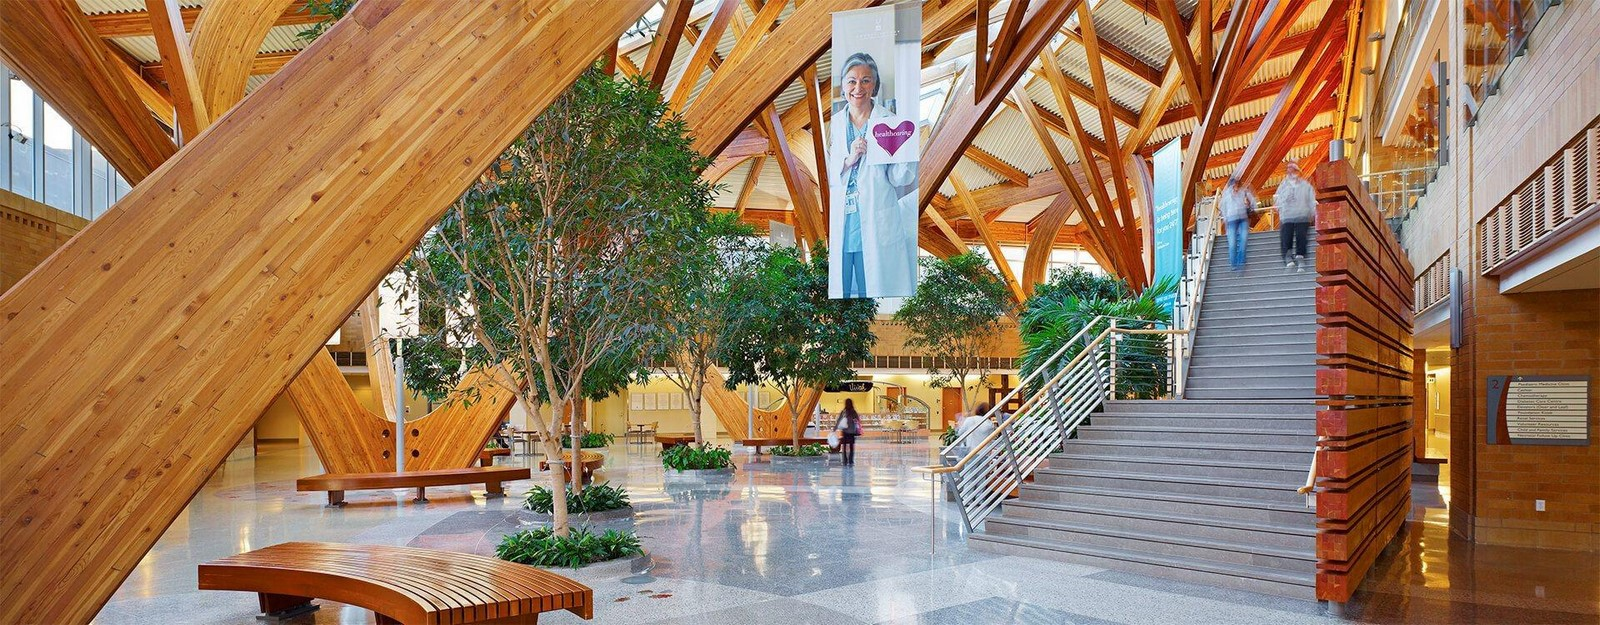 Credit Valley Hospital, Ontario, Canada - Sheet3